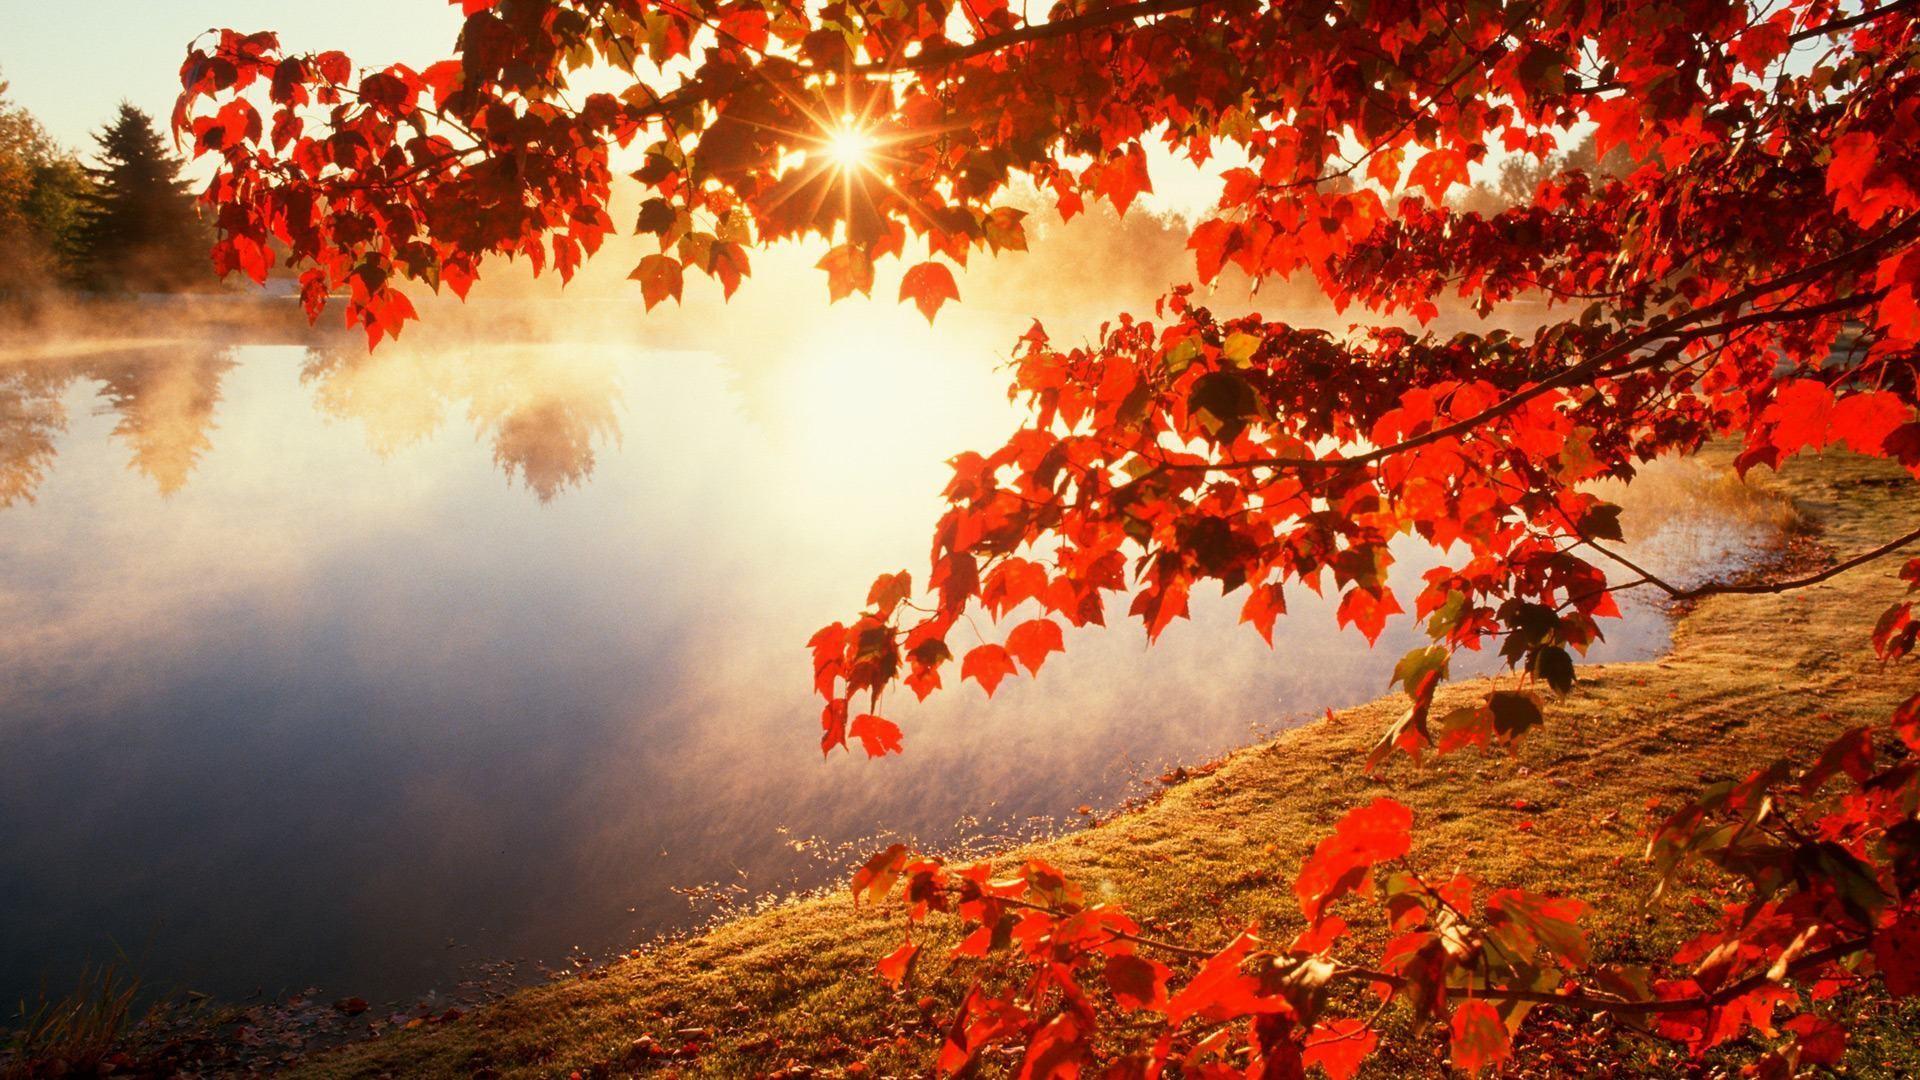 wallpaper.wiki-HD-Fall-Foliage-Images-PIC-WPE008842